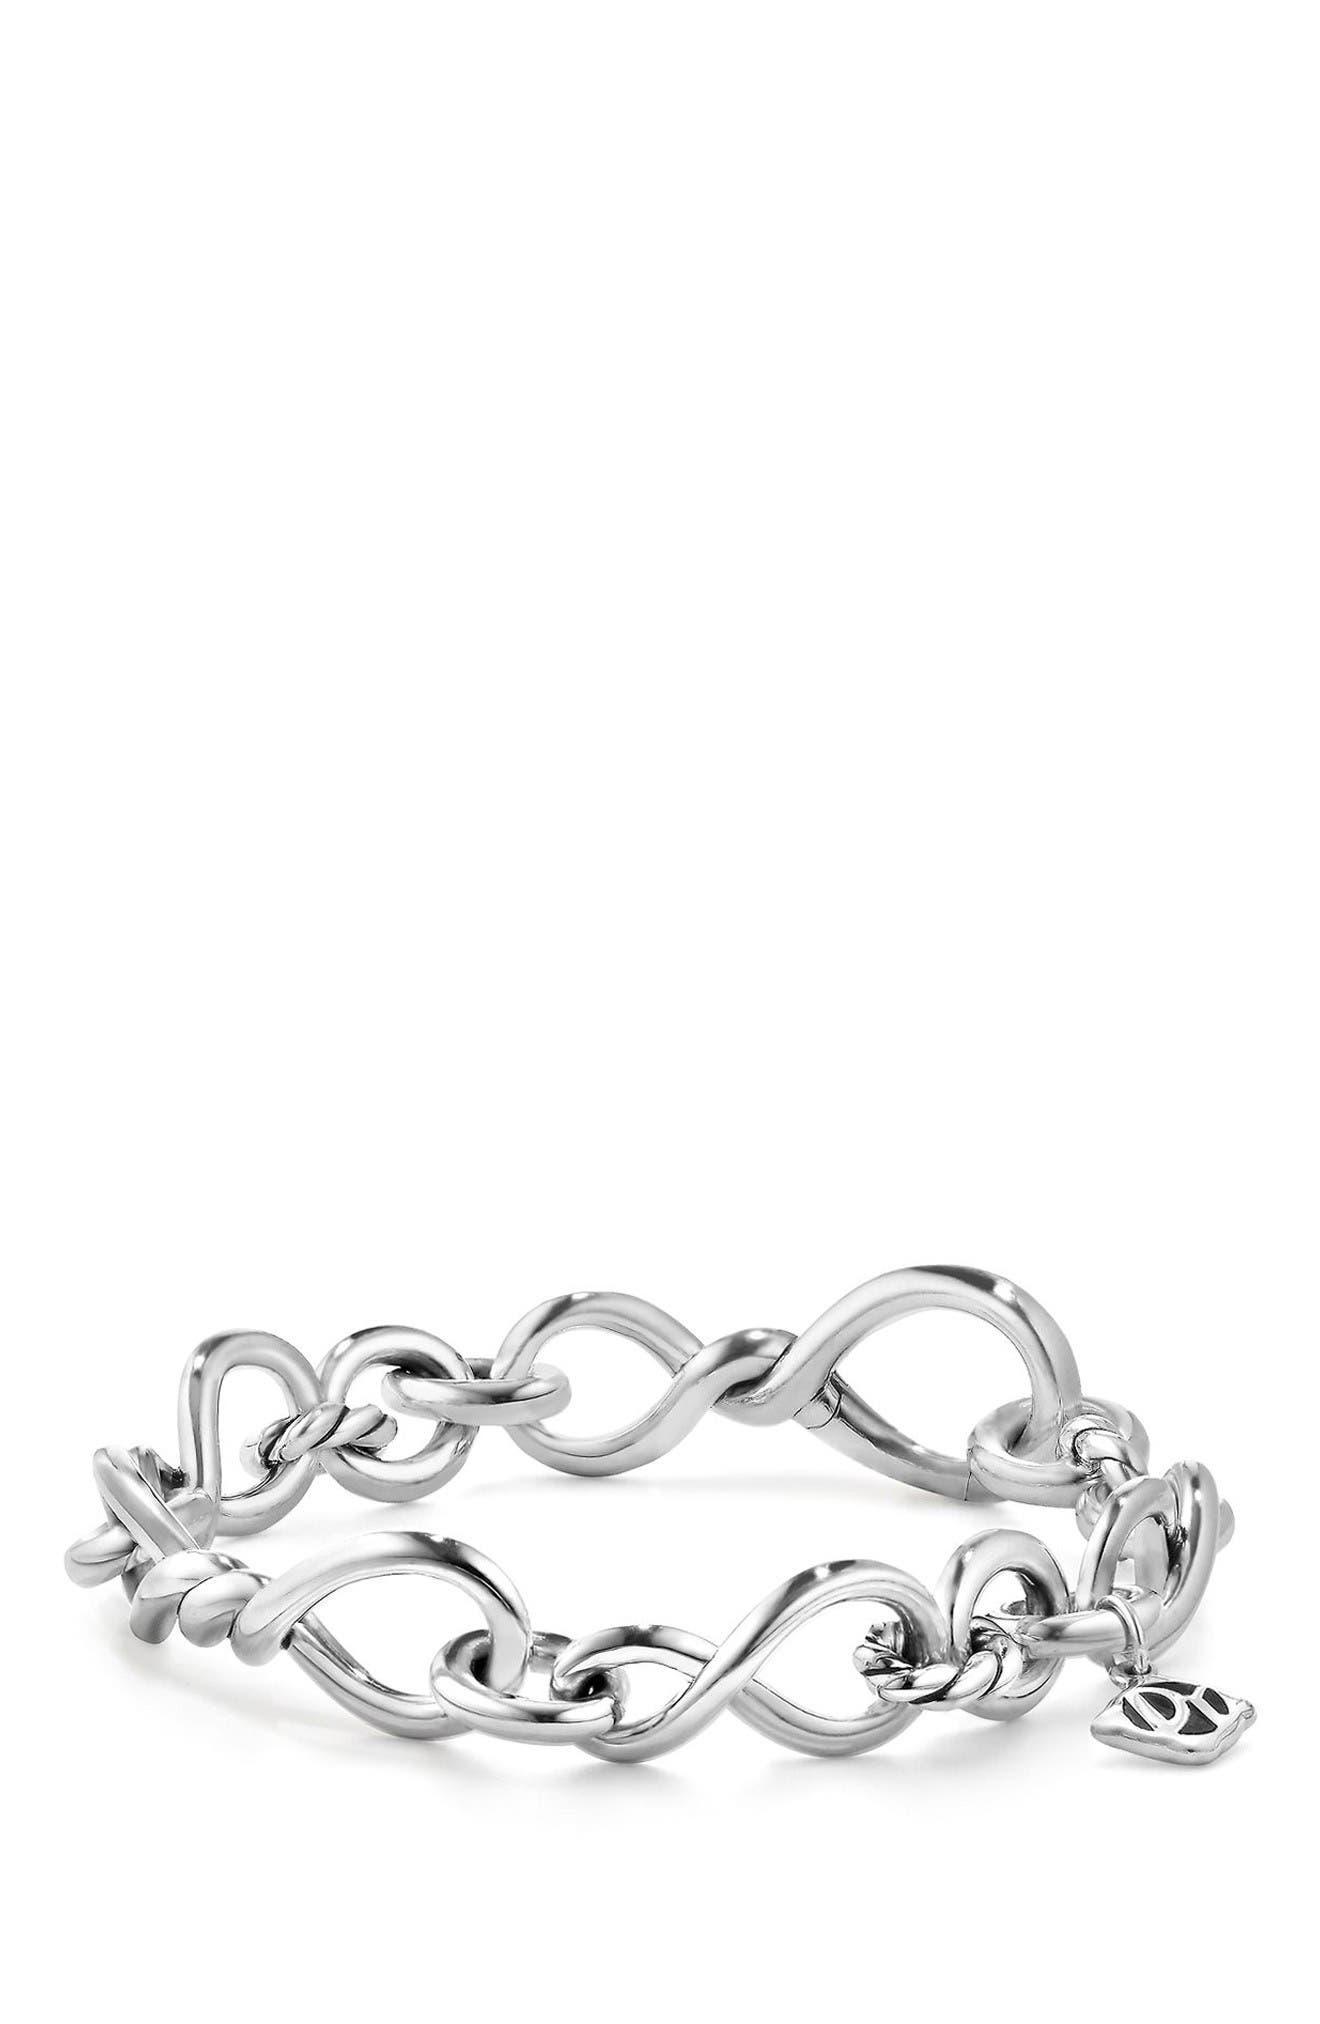 David Yurman Continuance Medium Chain Bracelet